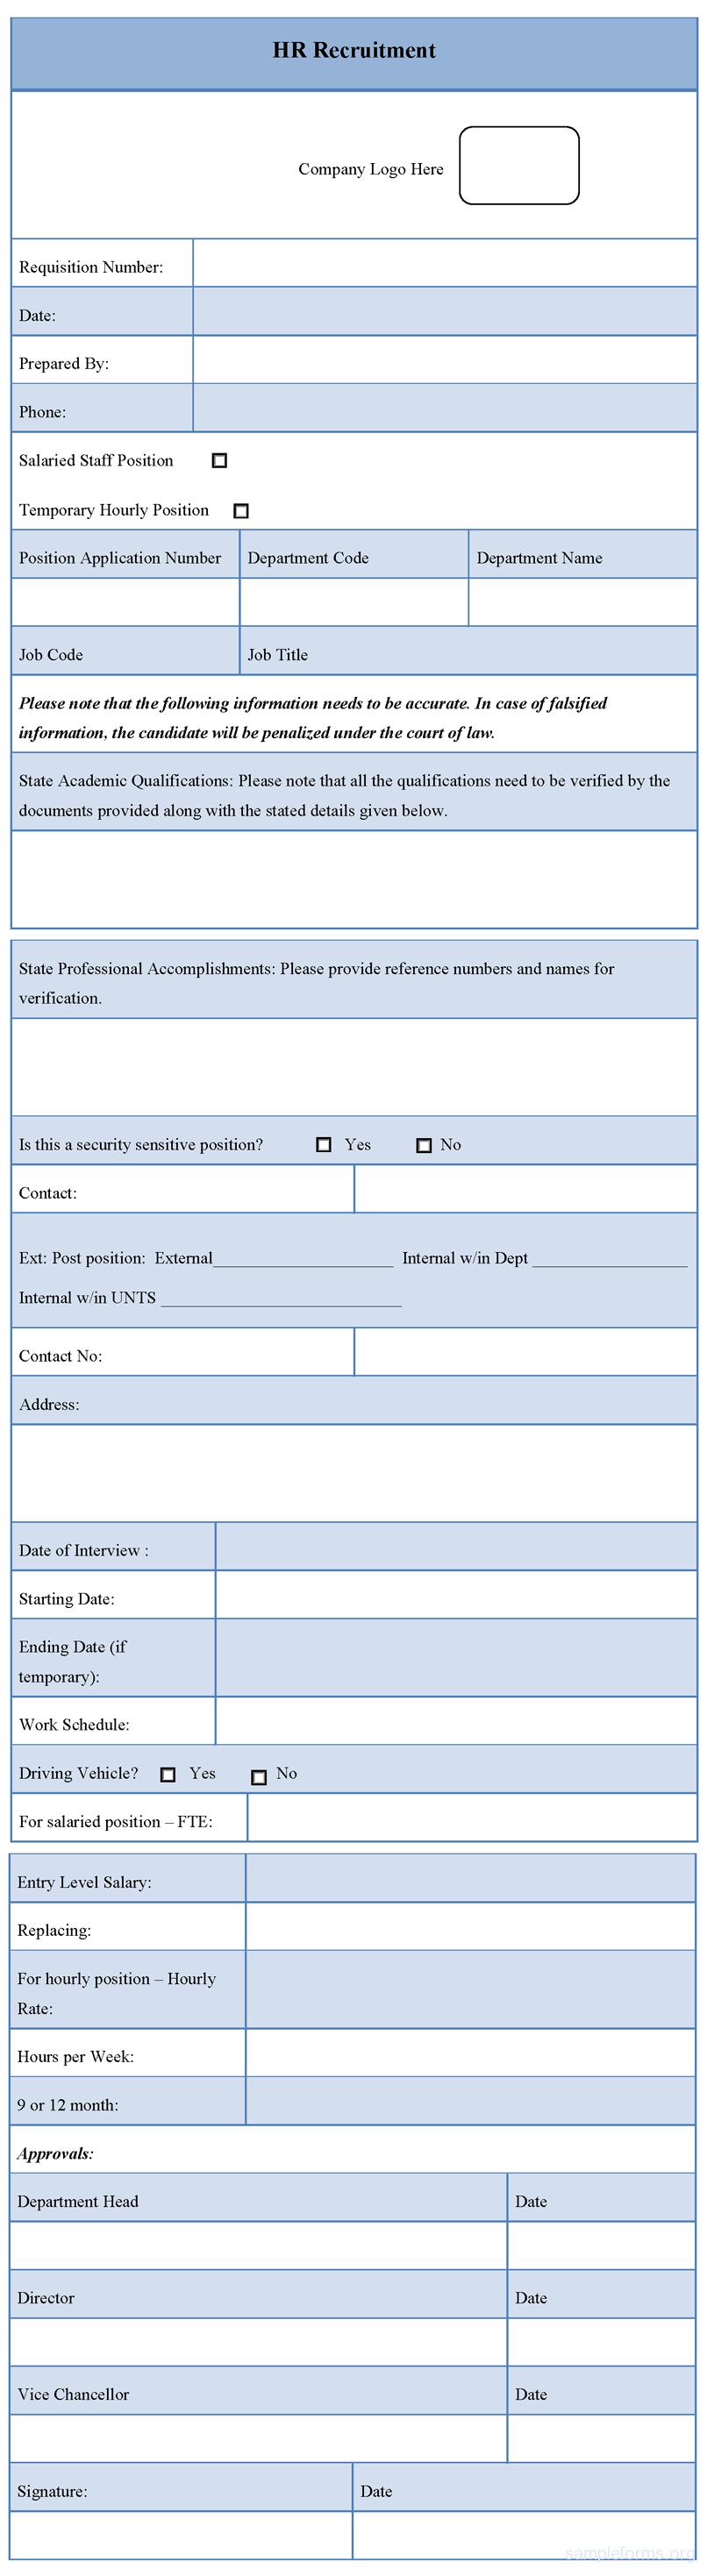 HrRecruitmentFormPng   Recruiter Forms